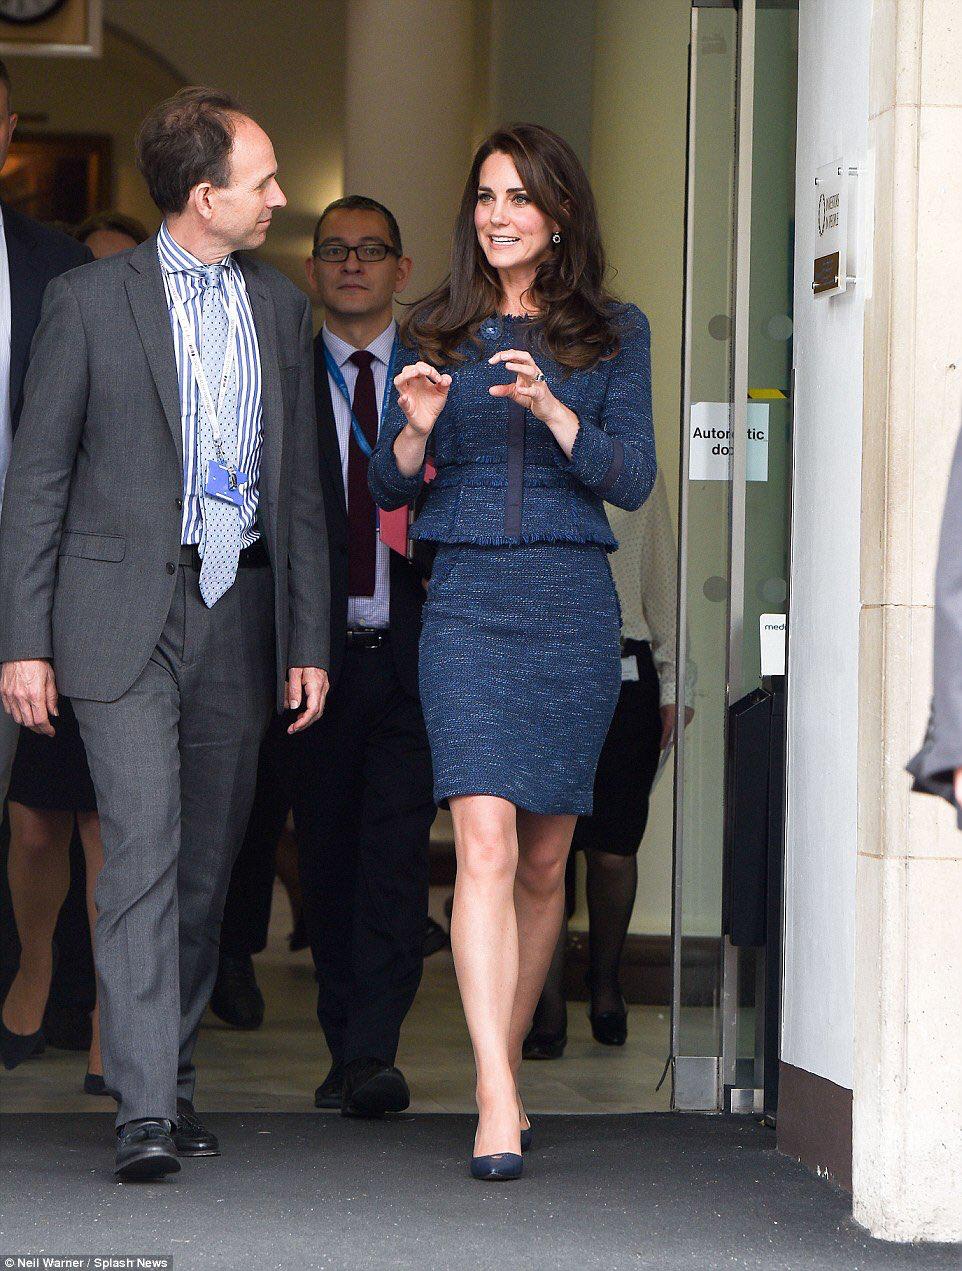 Duchess Of Cambridge Surprises London Bridge Attack Survivors